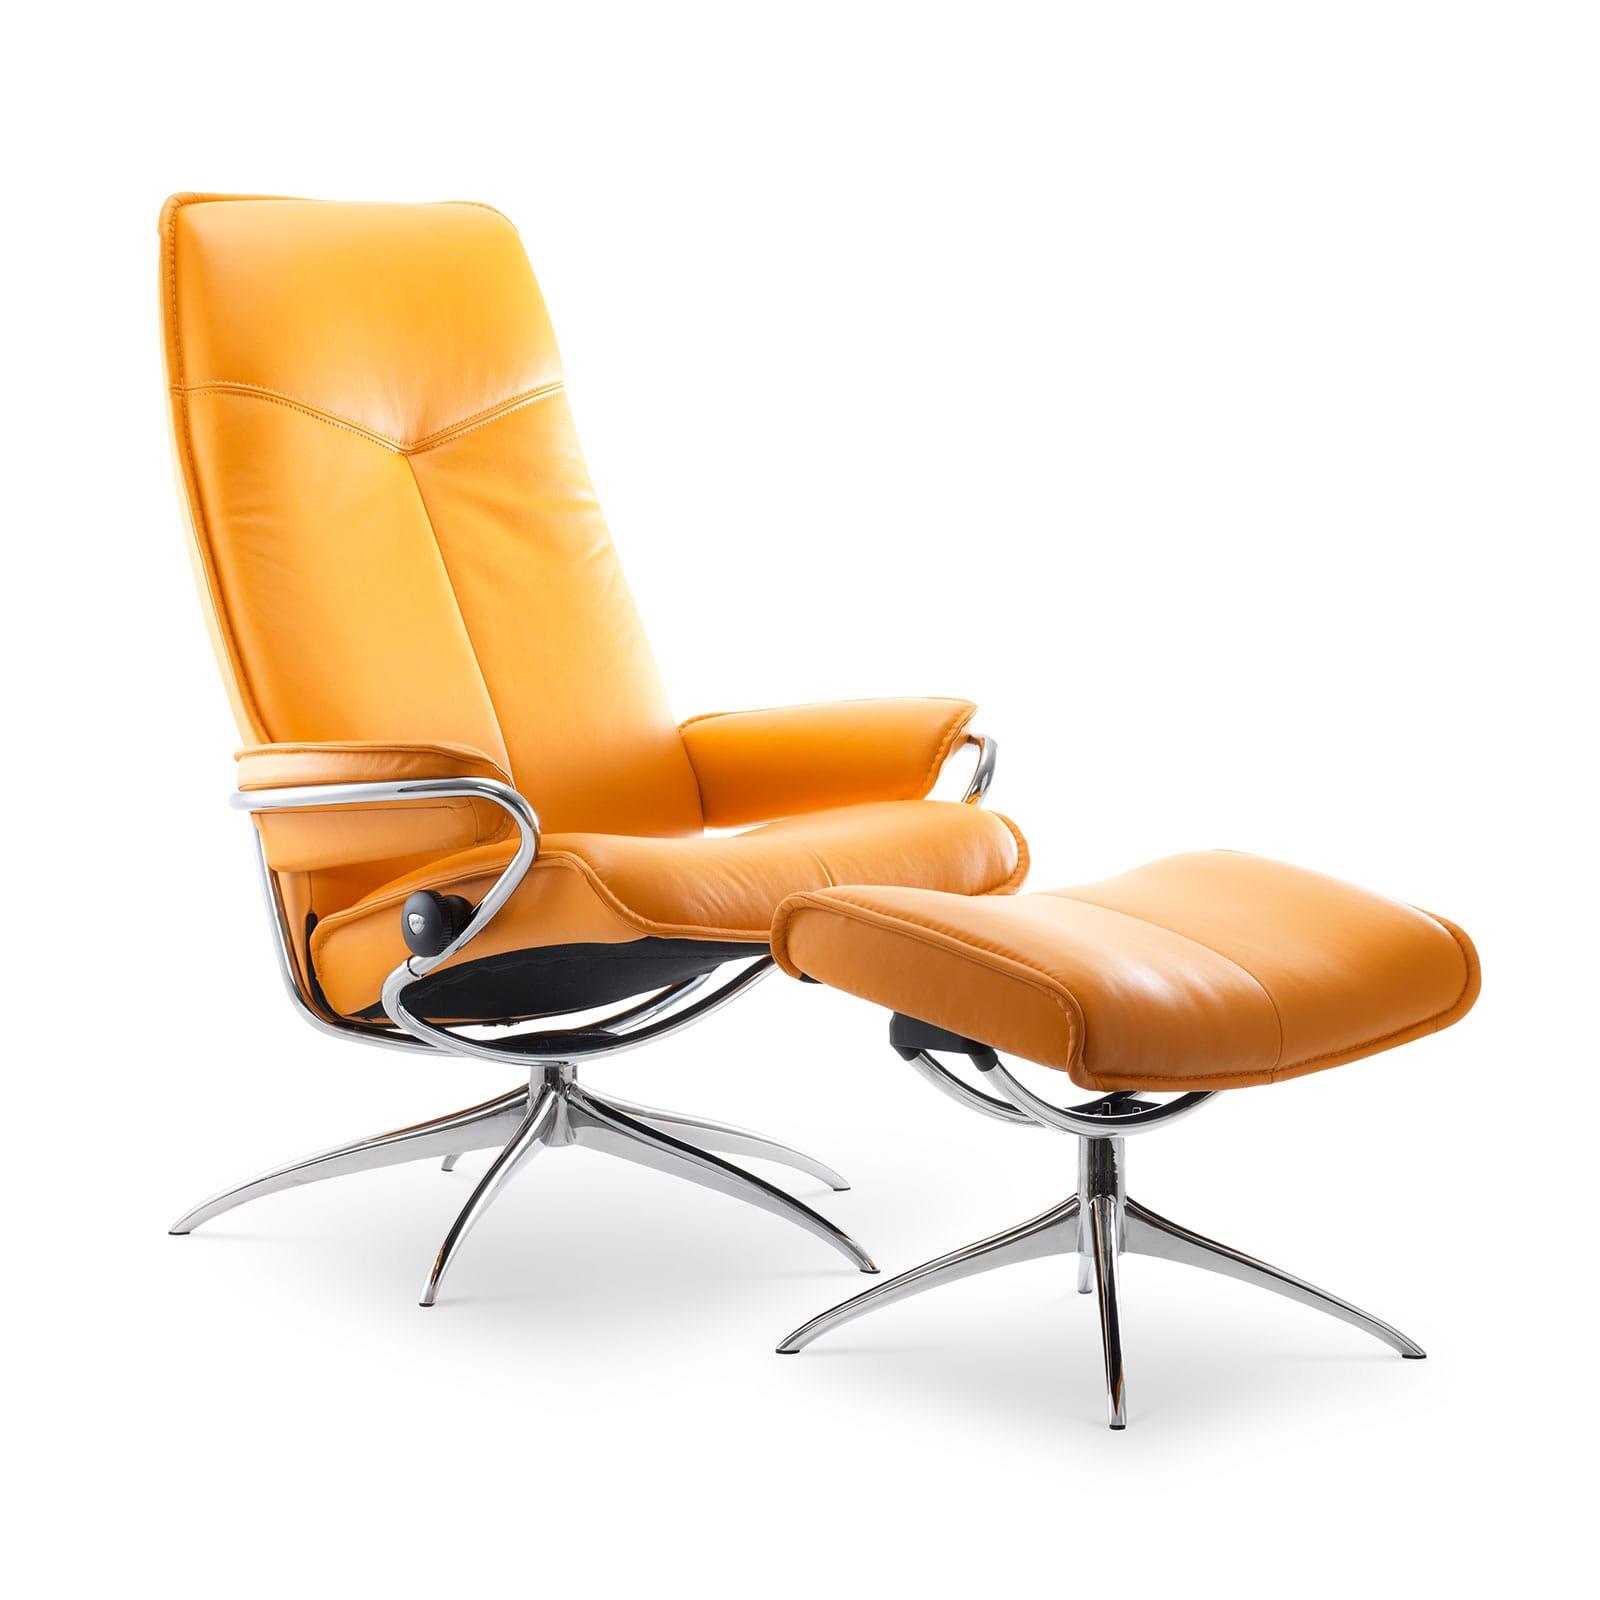 stressless sessel city high back paloma clementine ohne hocker. Black Bedroom Furniture Sets. Home Design Ideas